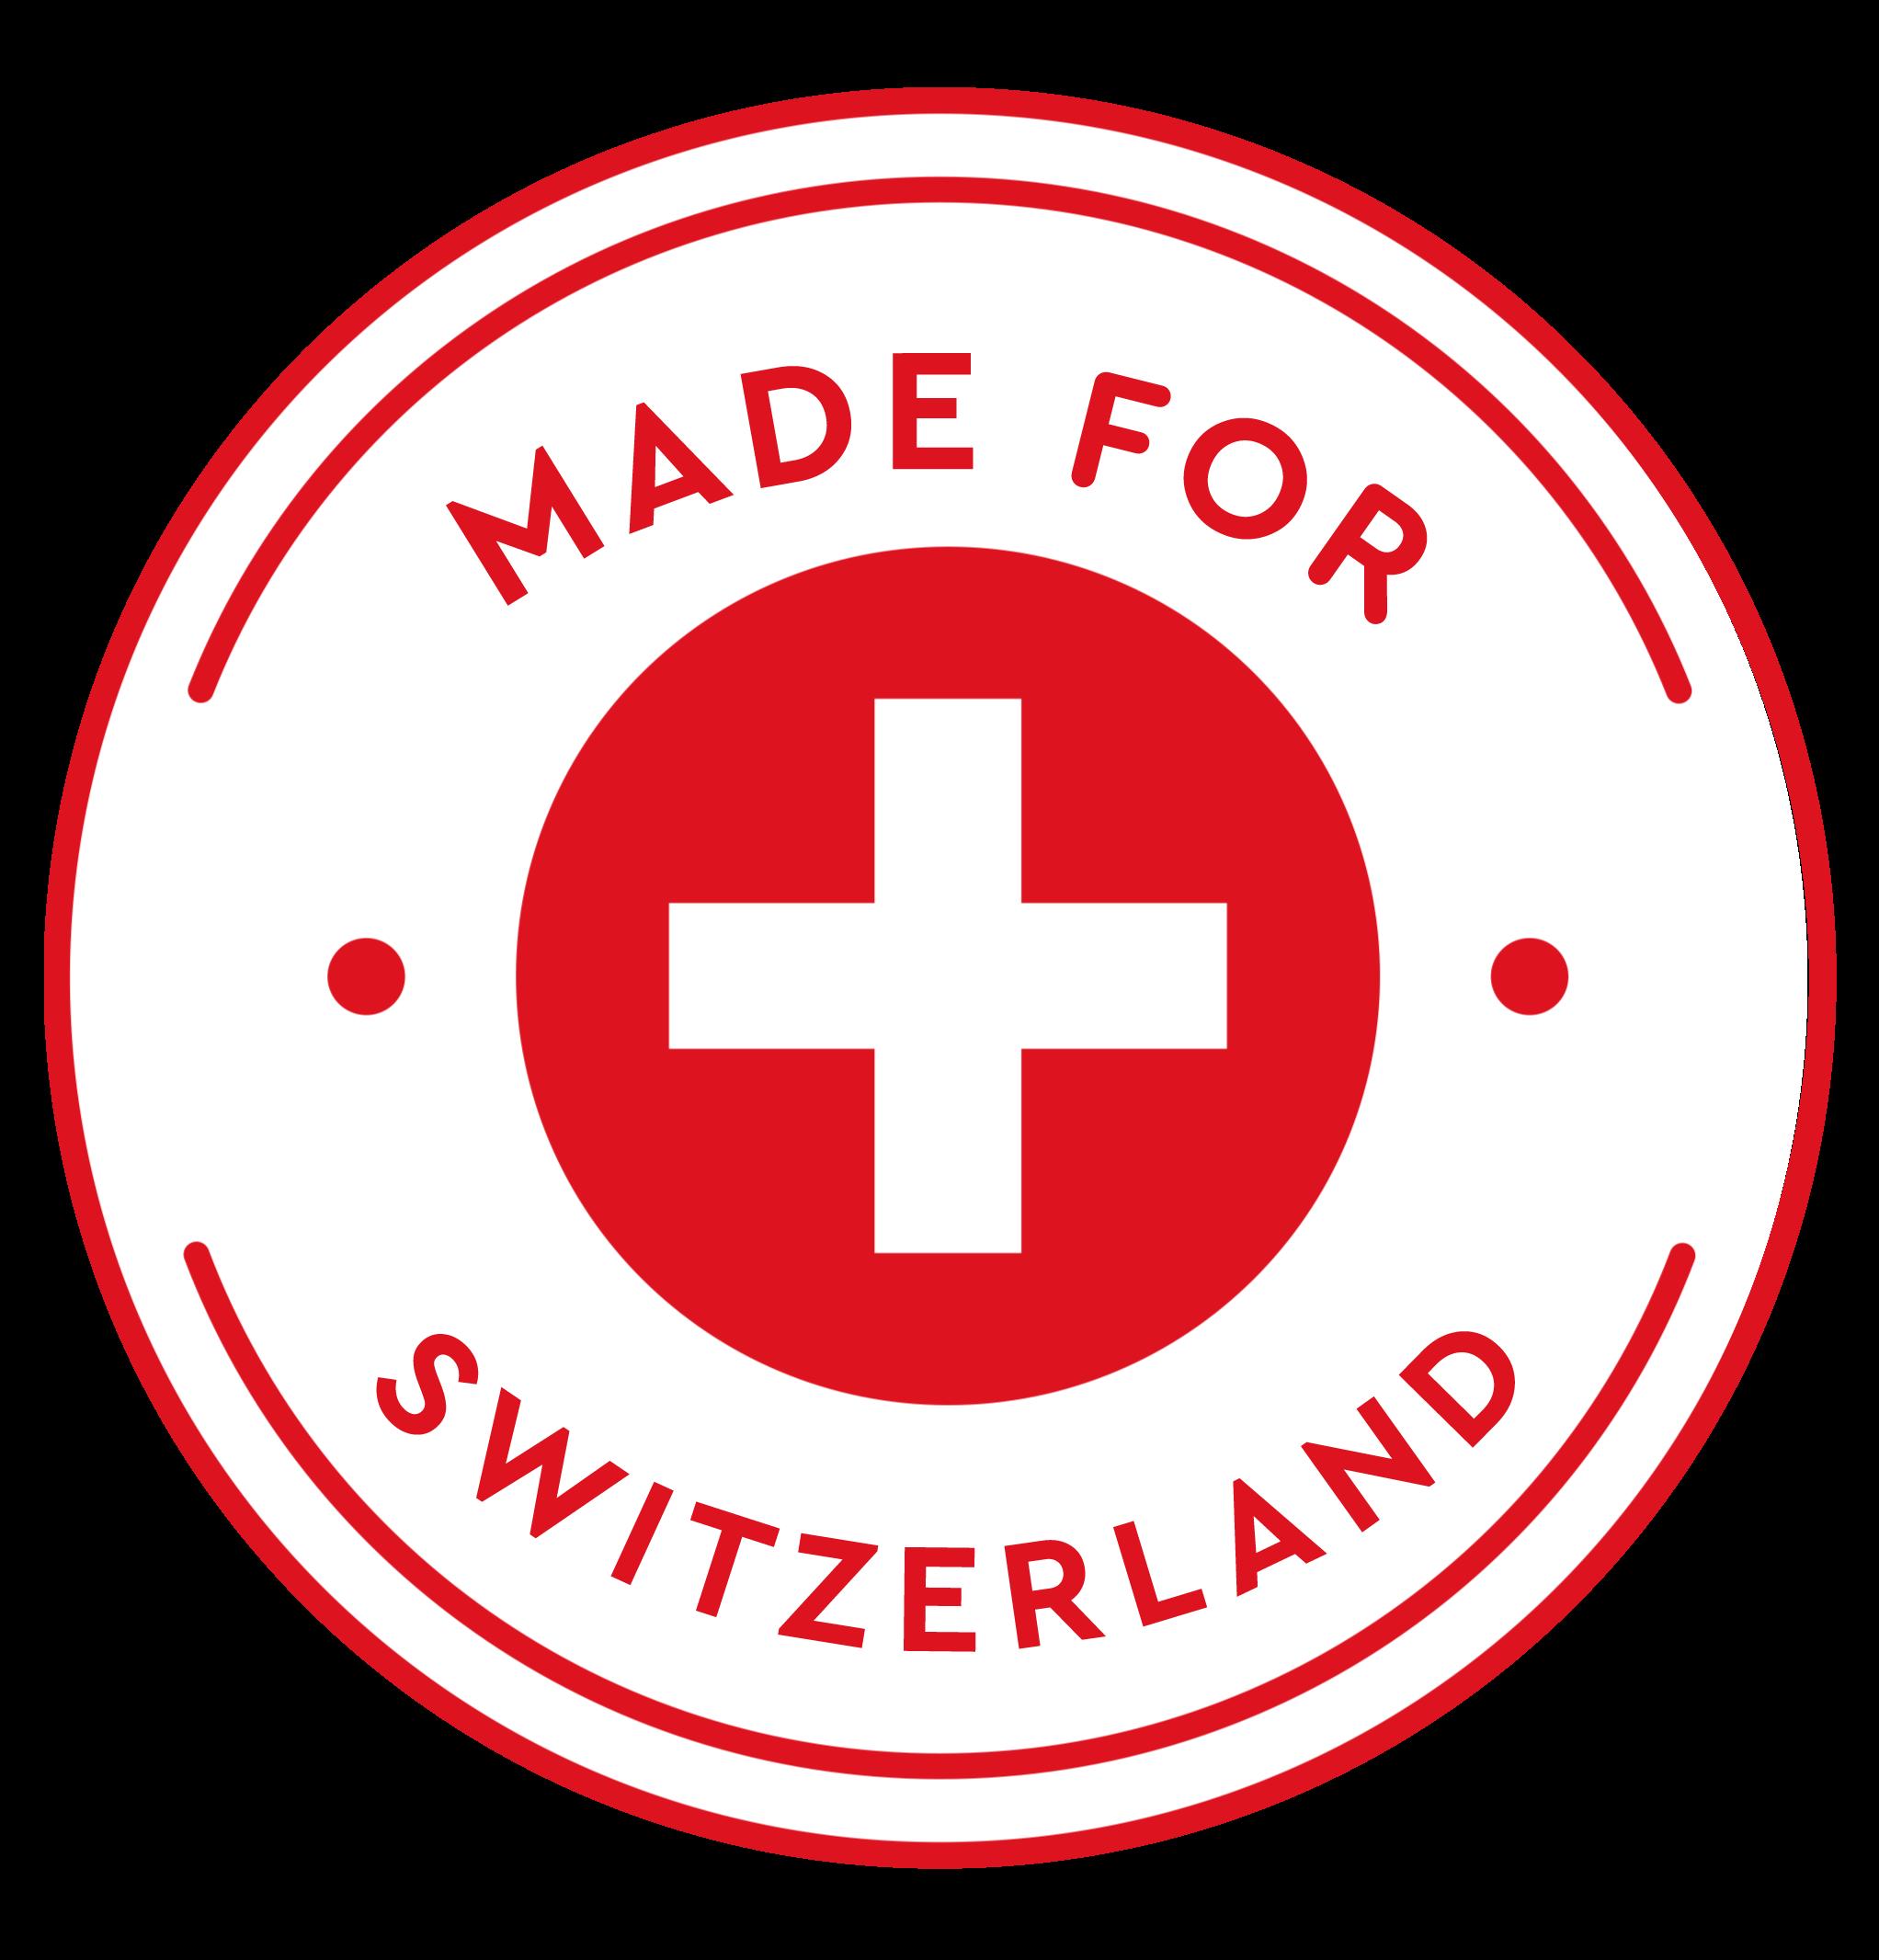 madeforswitzerland